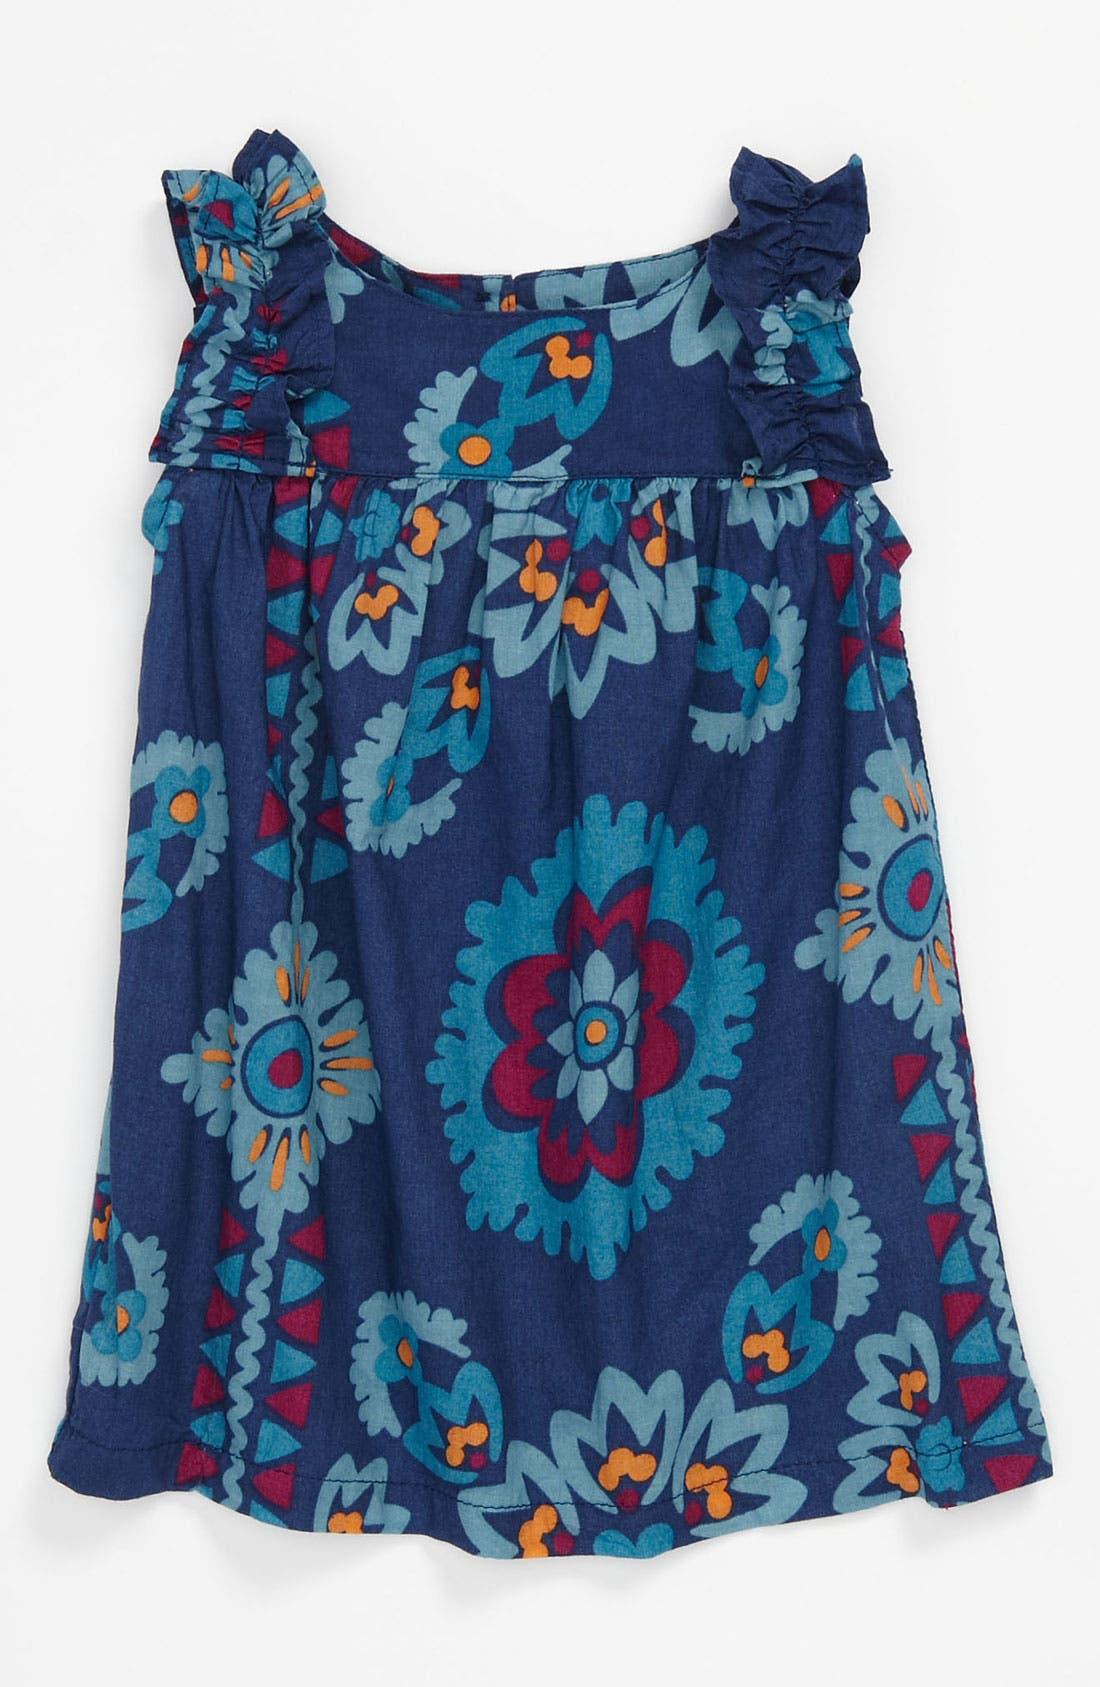 Main Image - Tea Collection 'Limpopo' Dress (Infant)